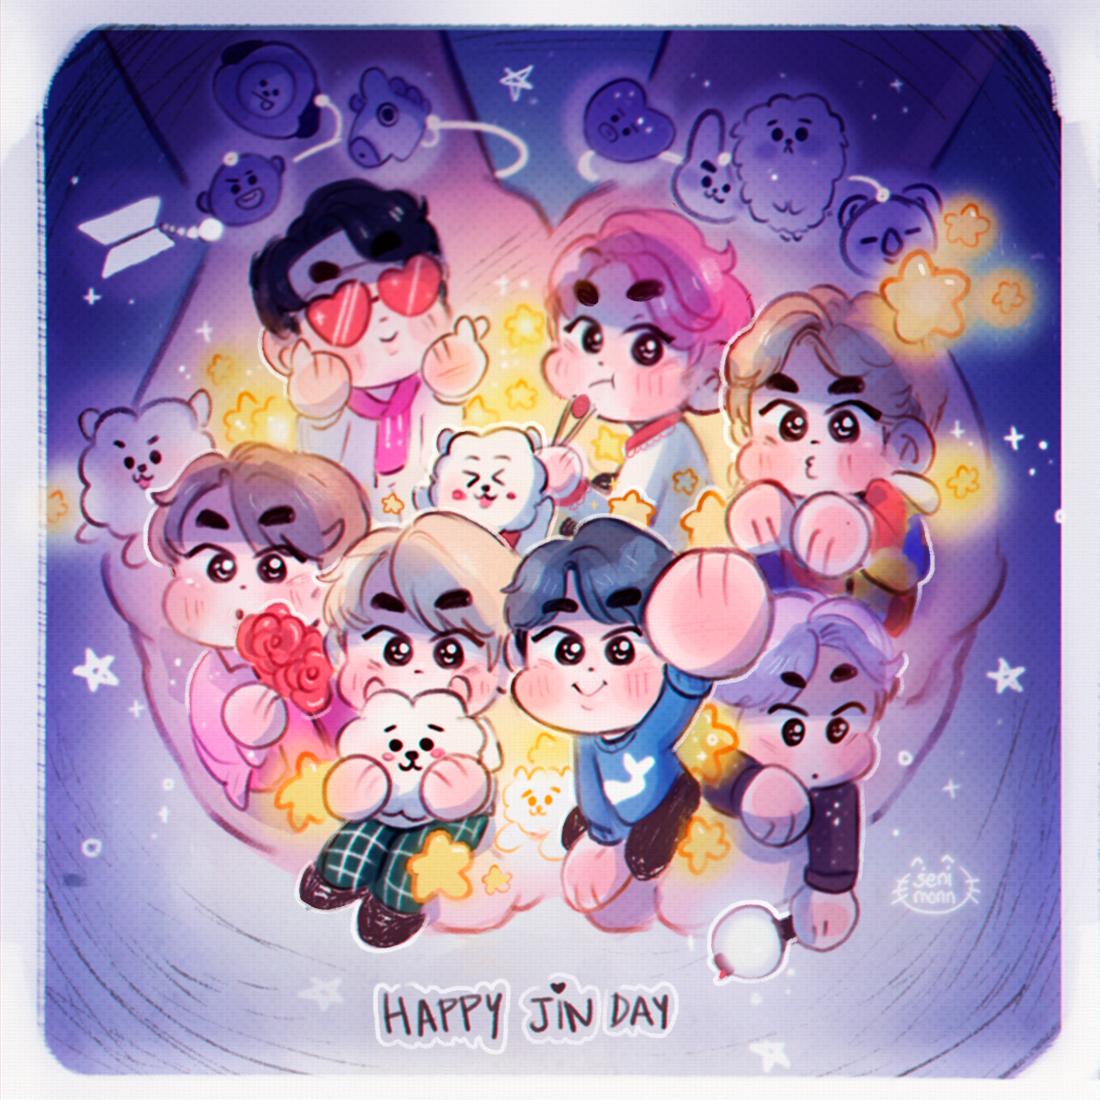 💖✨HAPPY JIN DAY ✨💖 #JINDAY #HappyJinDay #TonightAndAlwaysWithJin #JinOurHappiness #소중한_이밤_우리의별_석진 #SilverVoiceJin #JinOurDecemberStar #TonightYoureOurStar #OurFlowerofDecember @BTS_twt